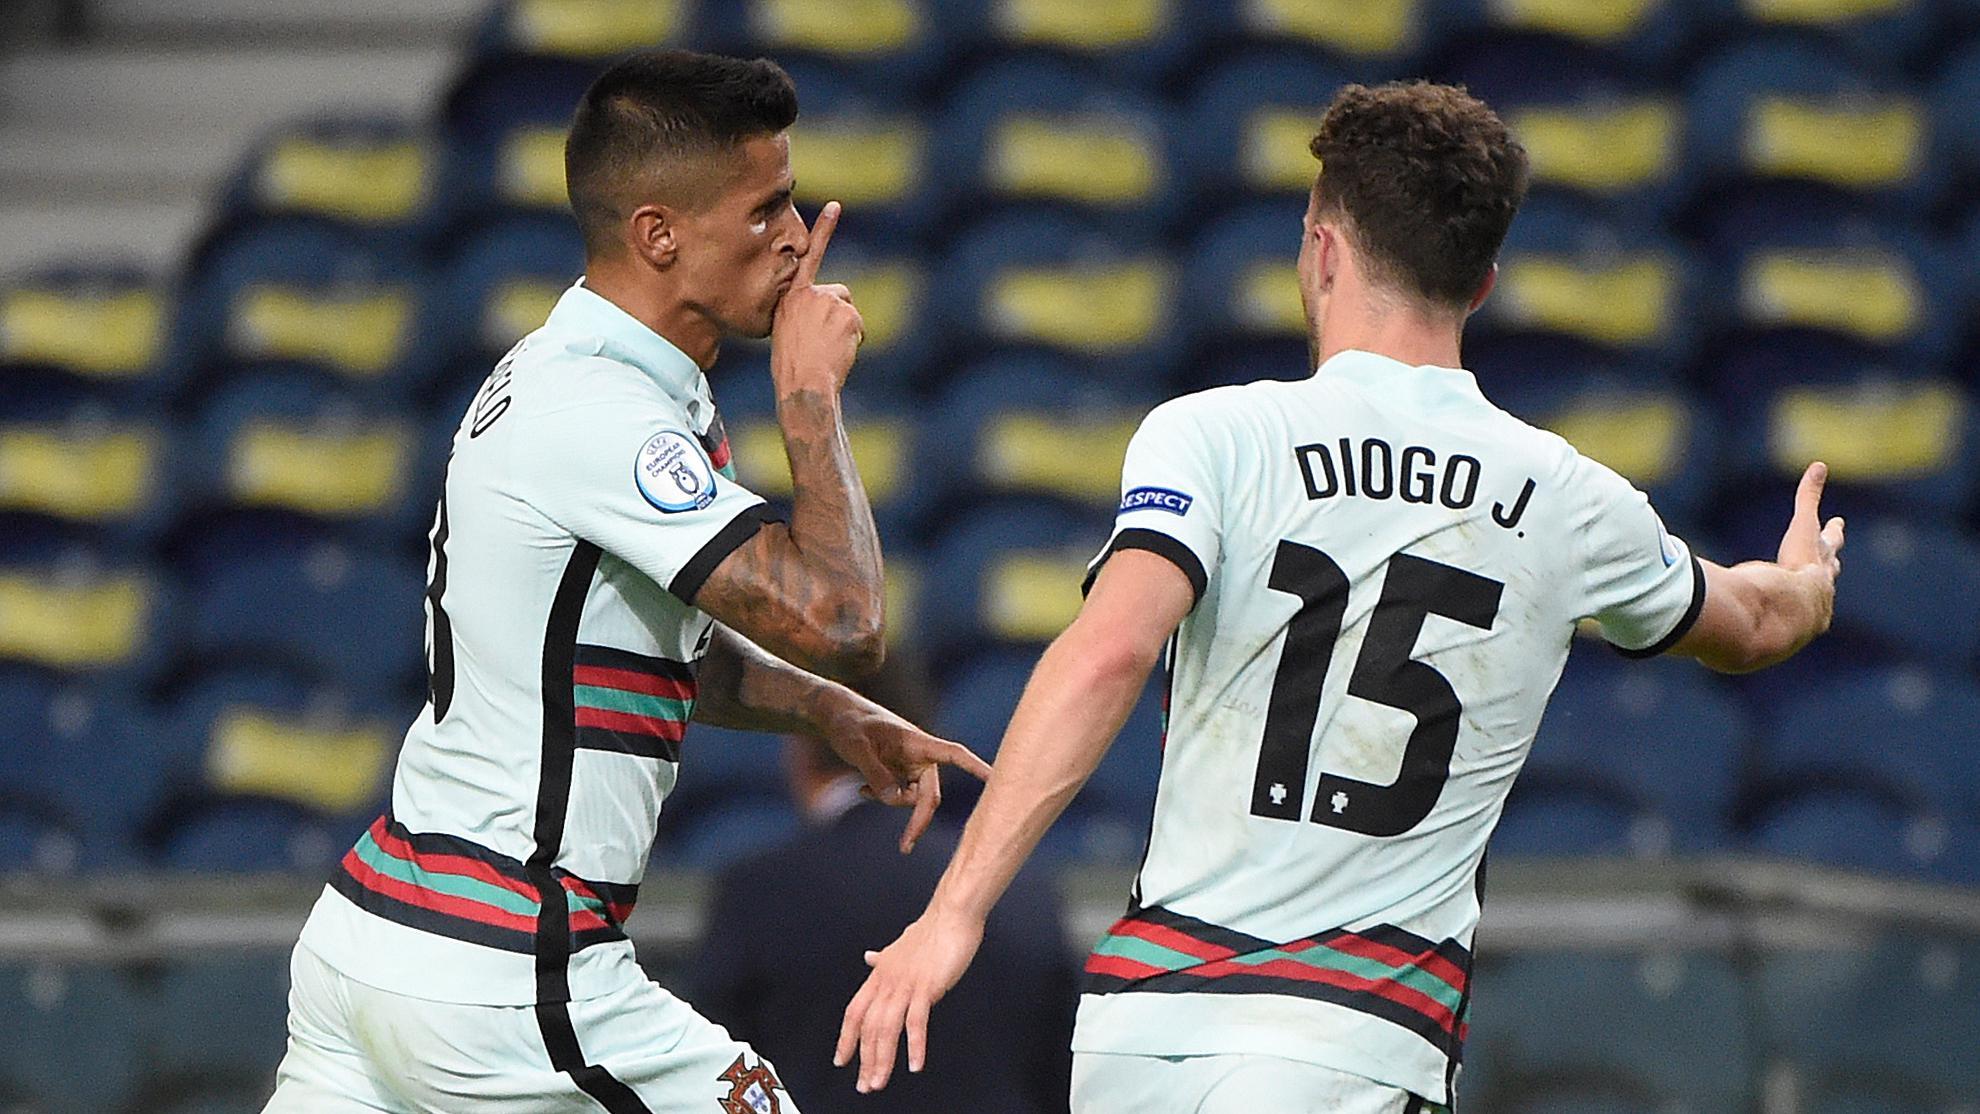 Portugal 4-1 Croatia: report